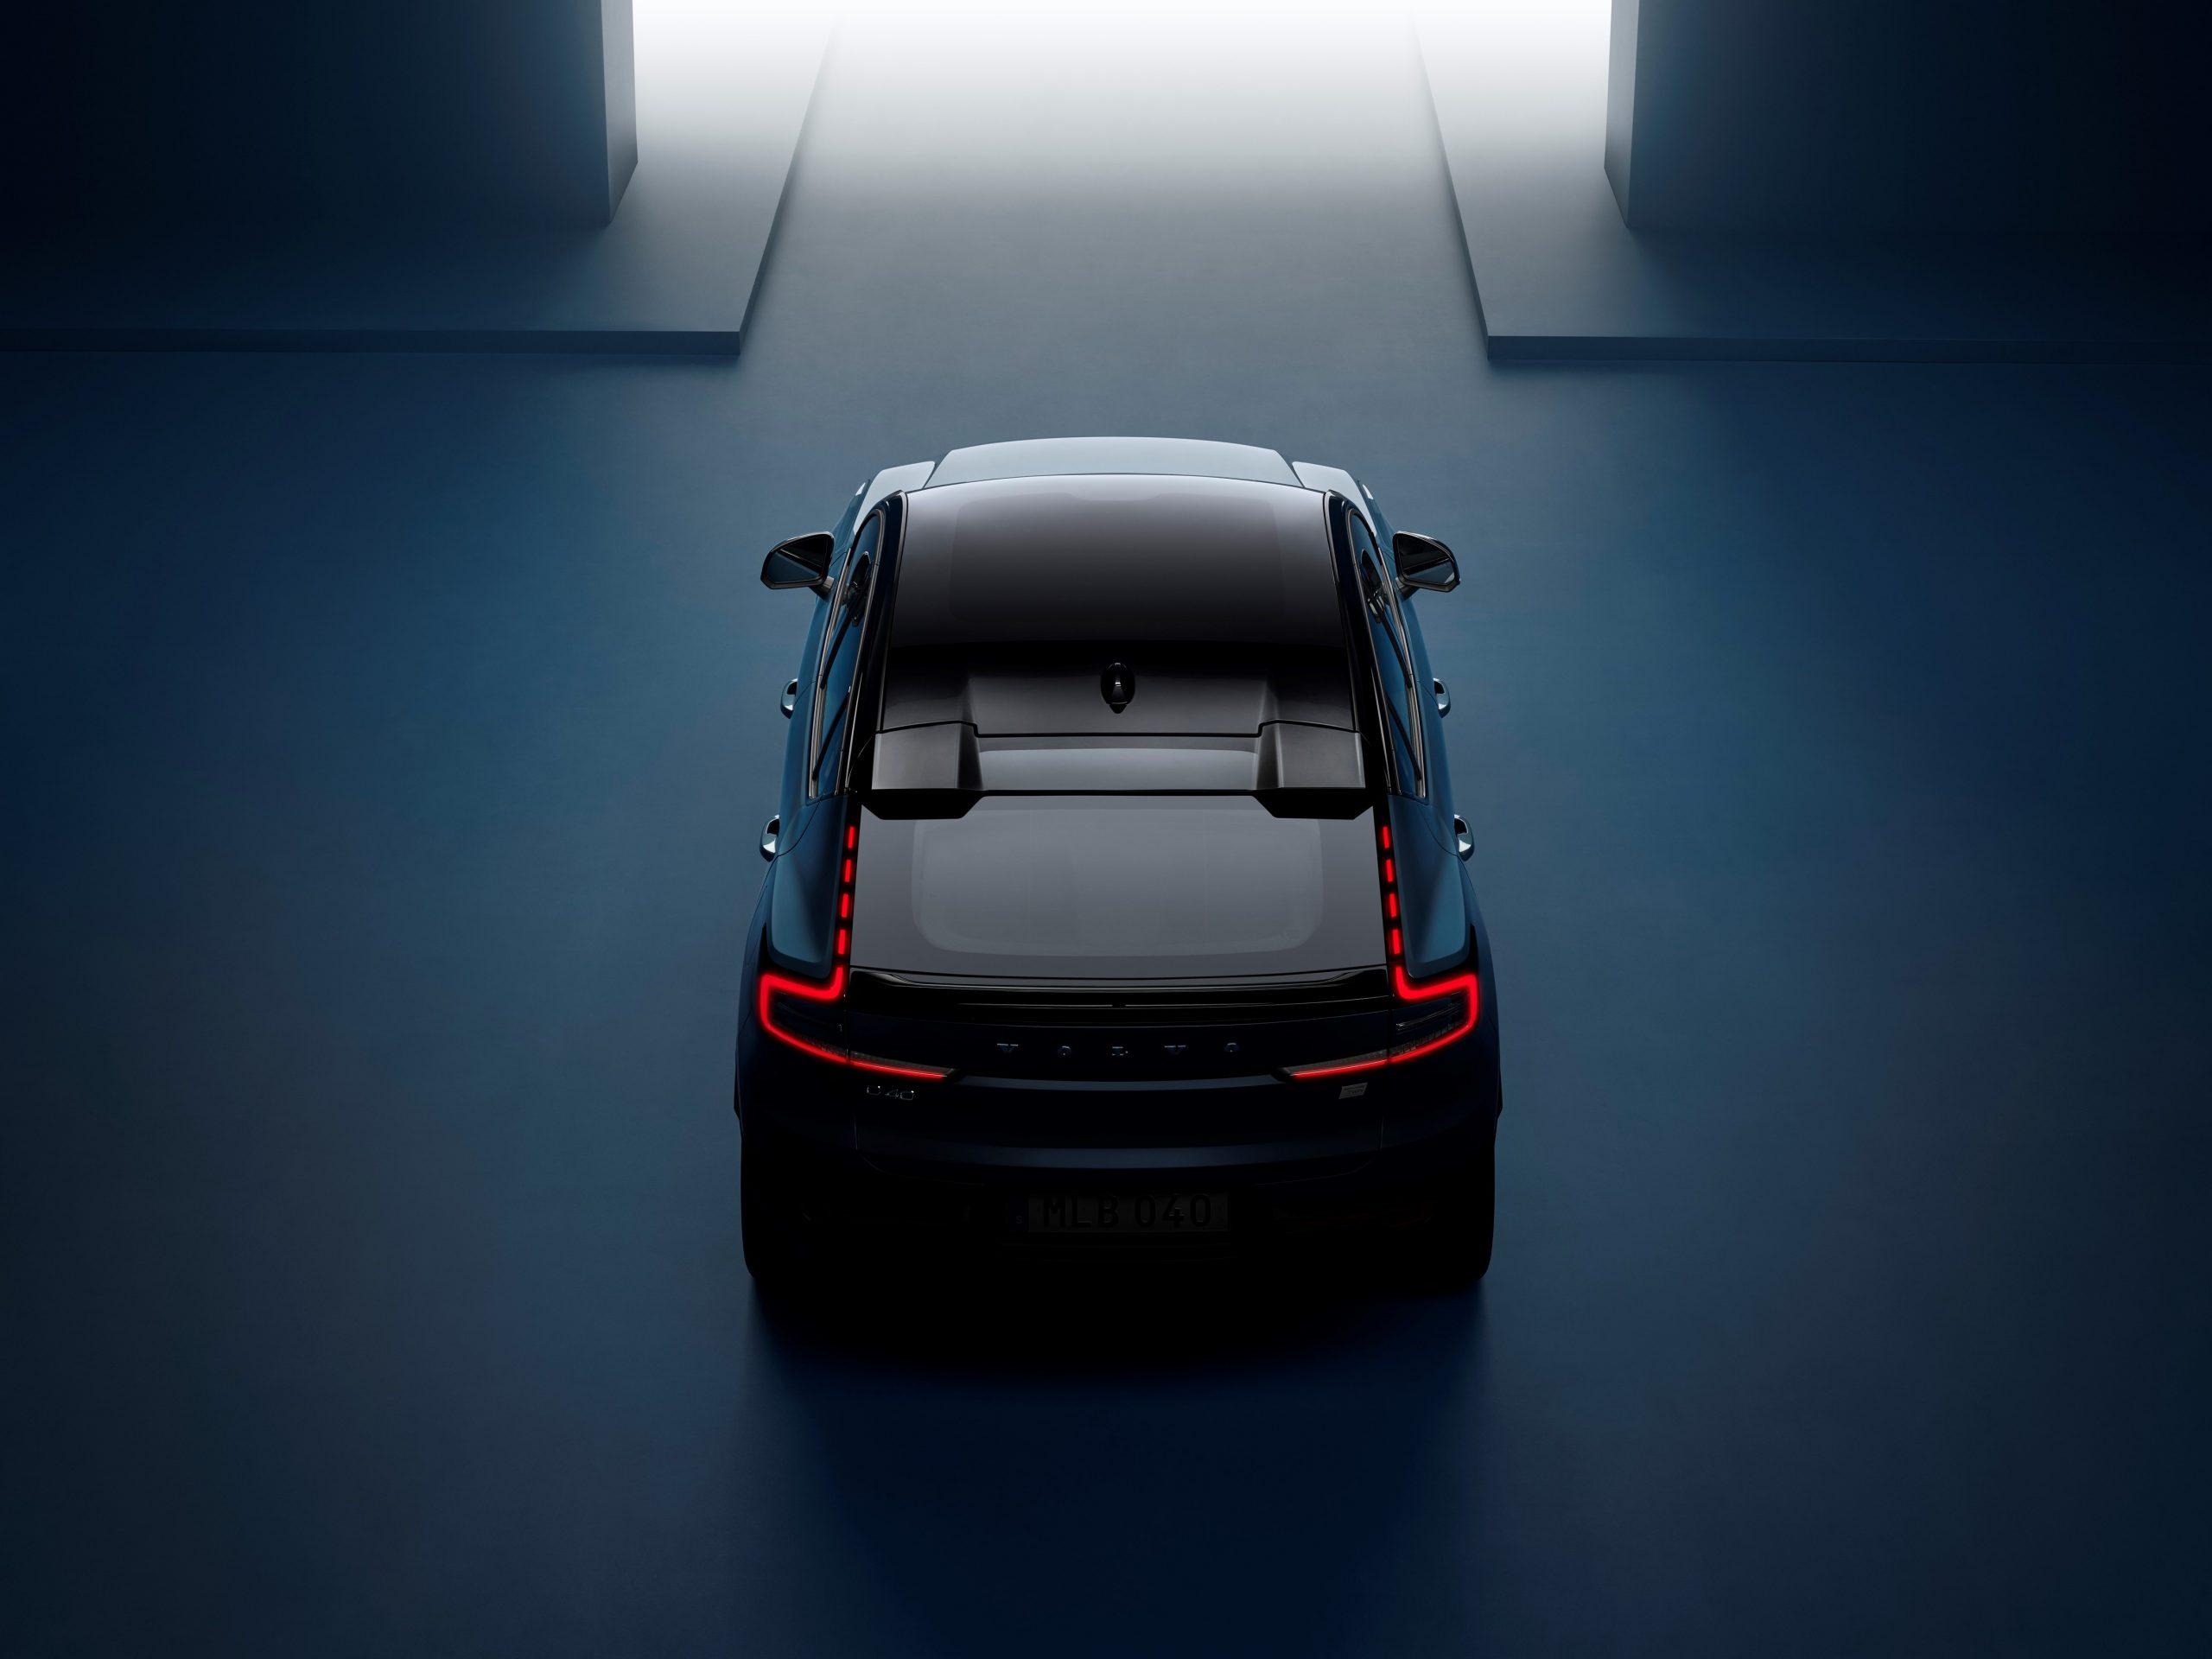 Volvo C40 Recharge Studio overhead rear taillights